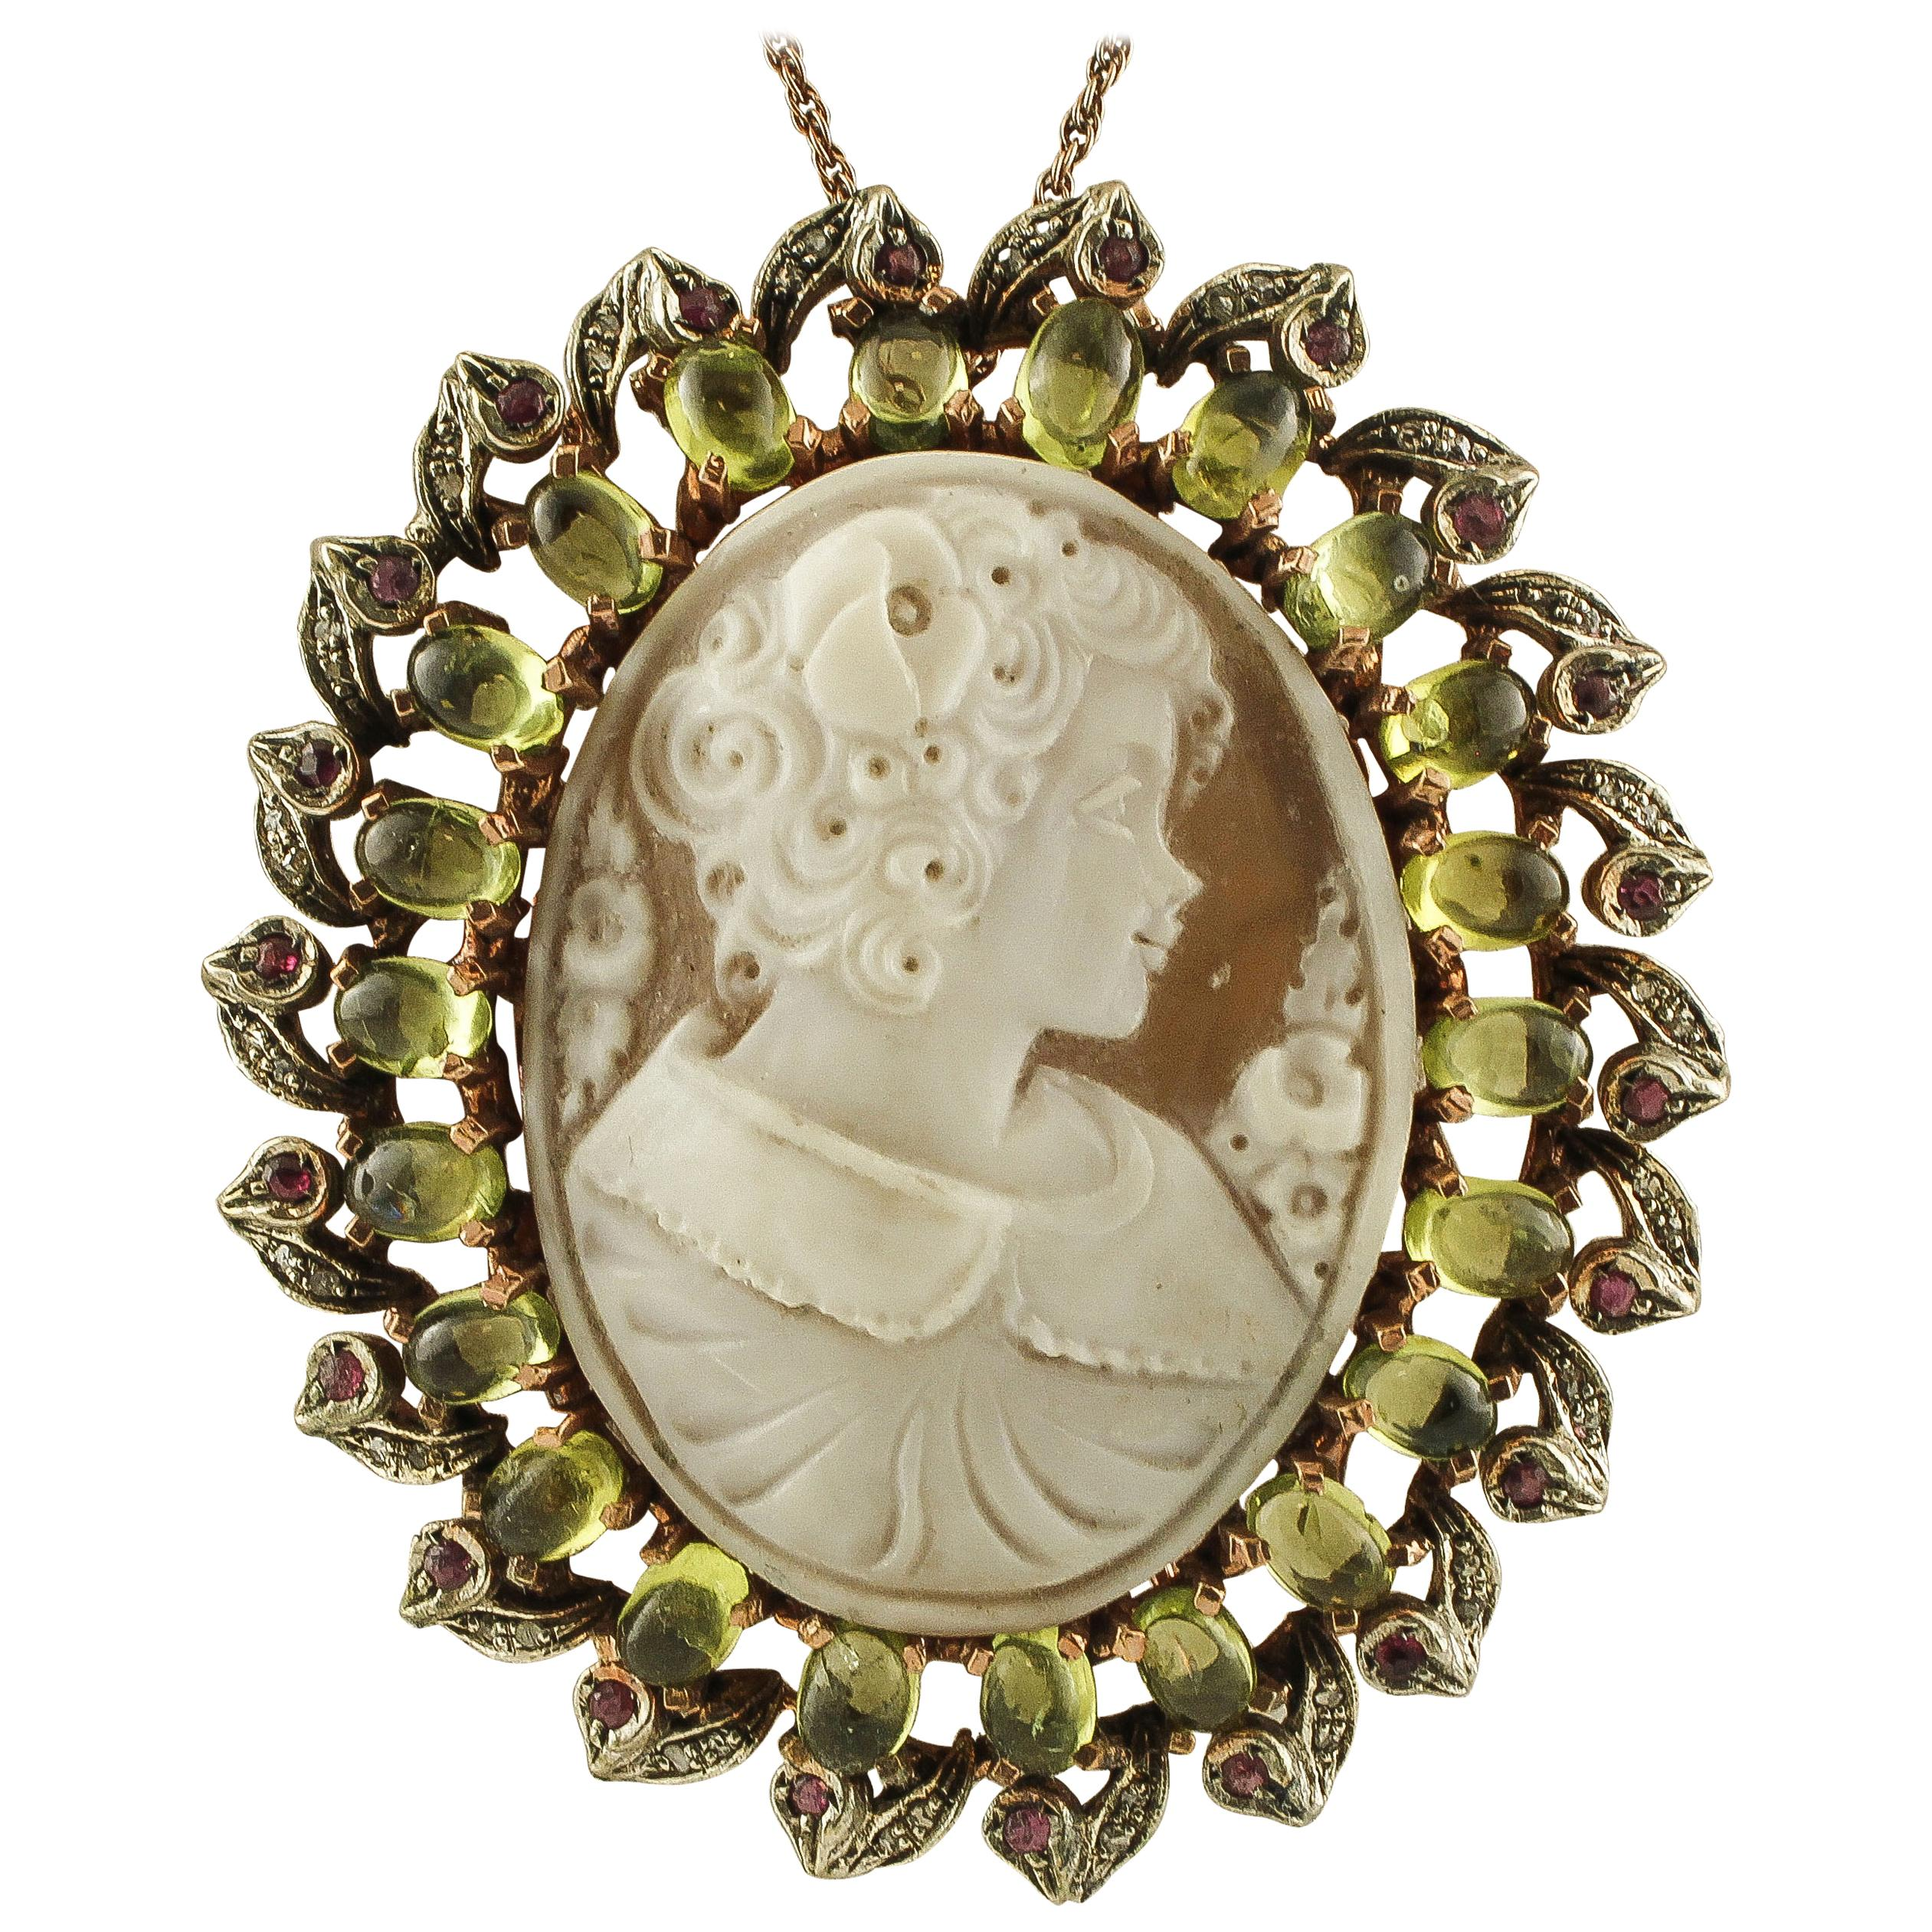 Cameo, Peridot, Diamonds, Rubies, 9 Karat Rose Gold and Silver Pendant/Brooch